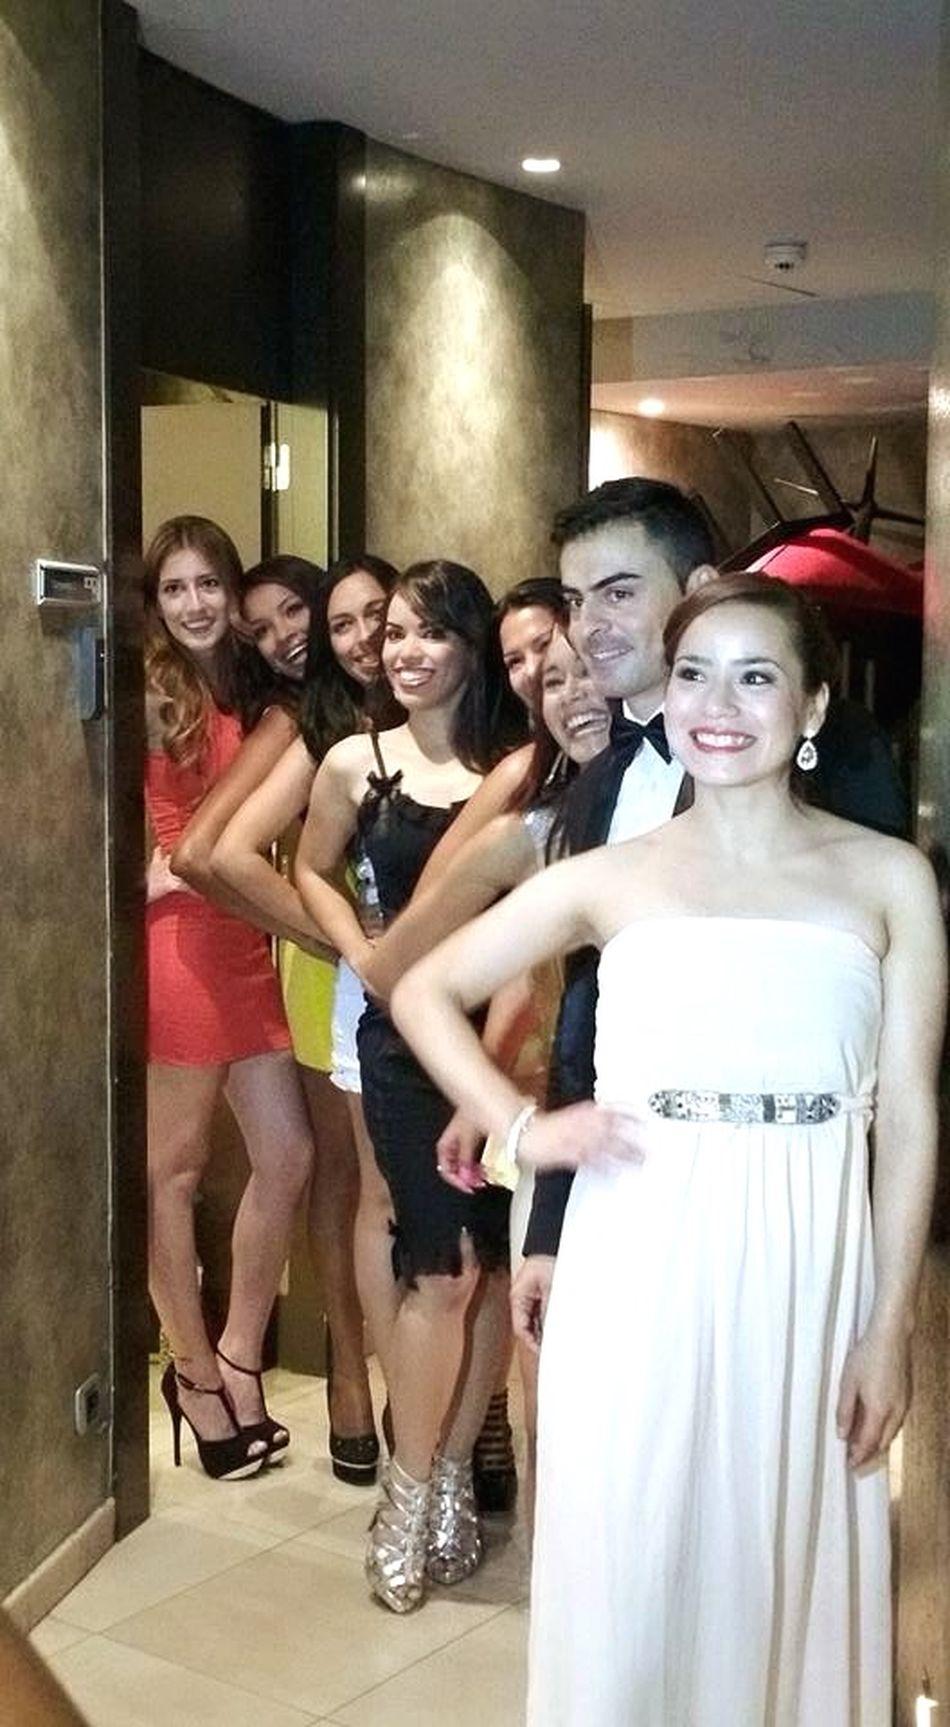 Gala MissChicaLatina2015 Models Model Backstage